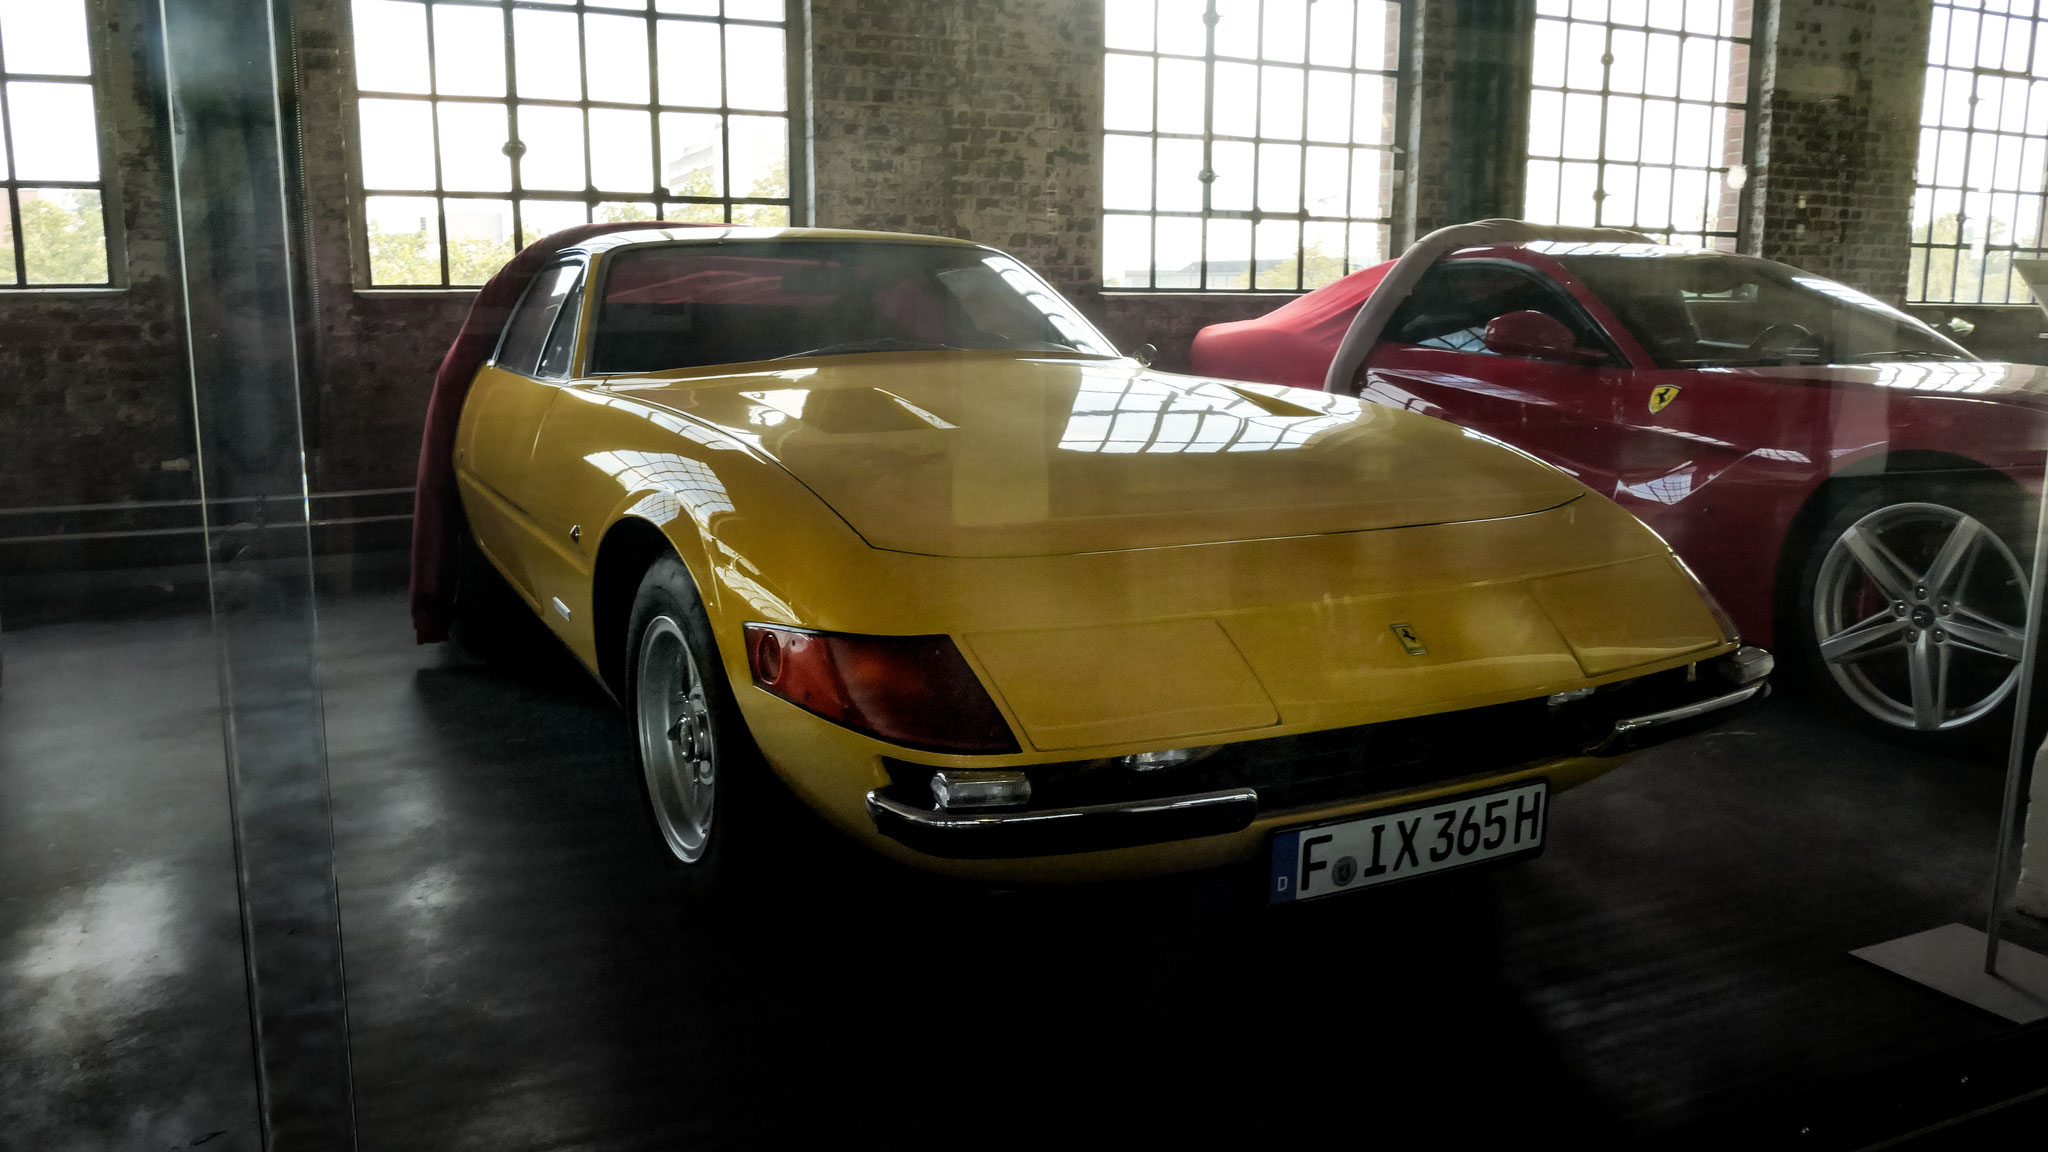 Ferrari 365 Daytona - F-IX-365H